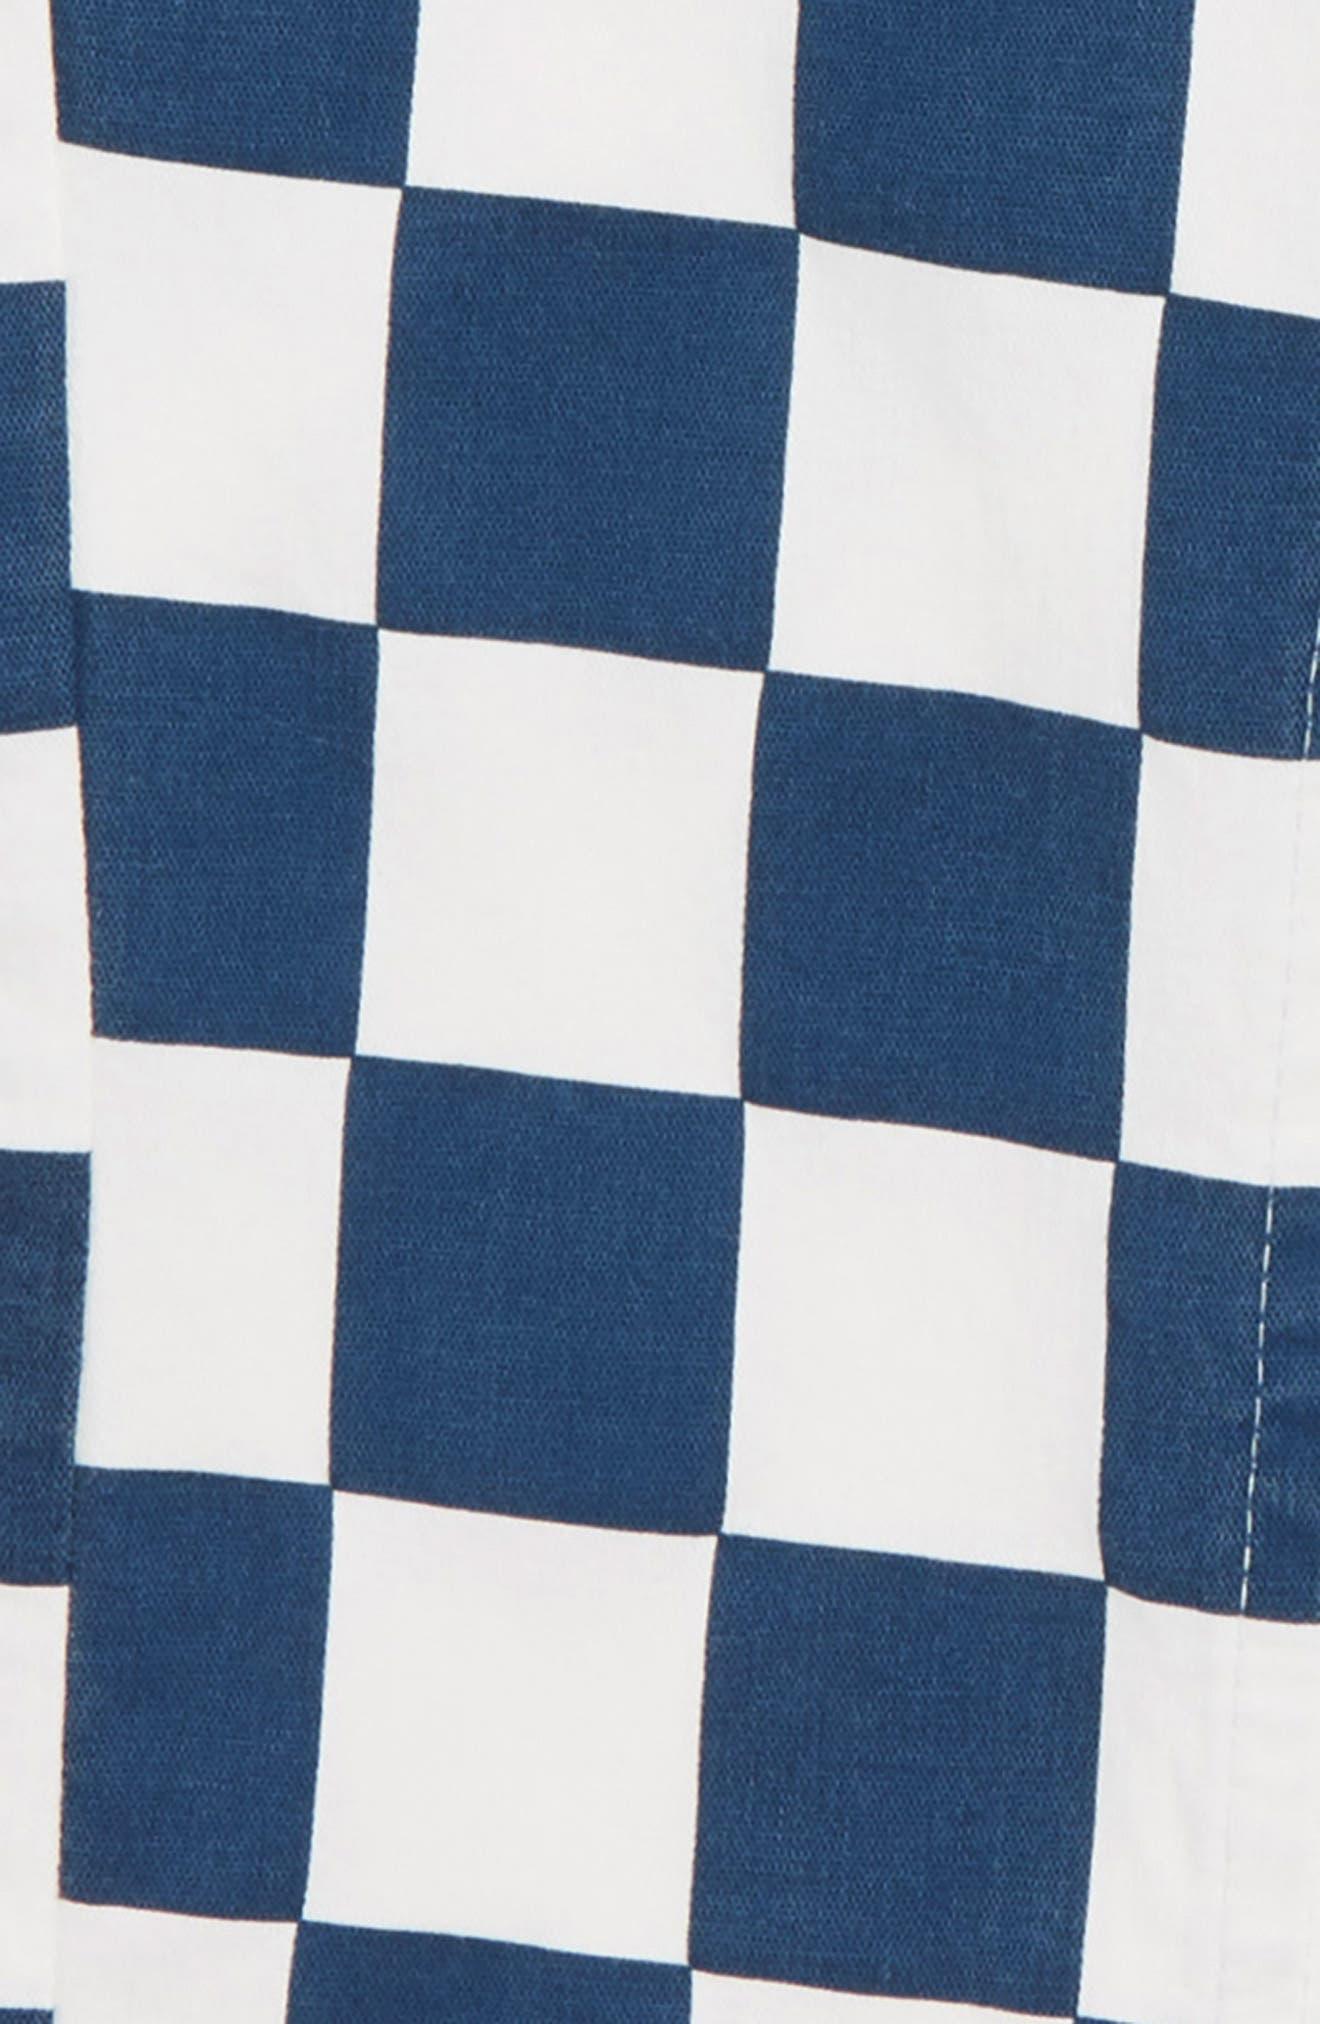 Bo Checkerboard Pants,                             Alternate thumbnail 2, color,                             NAVY